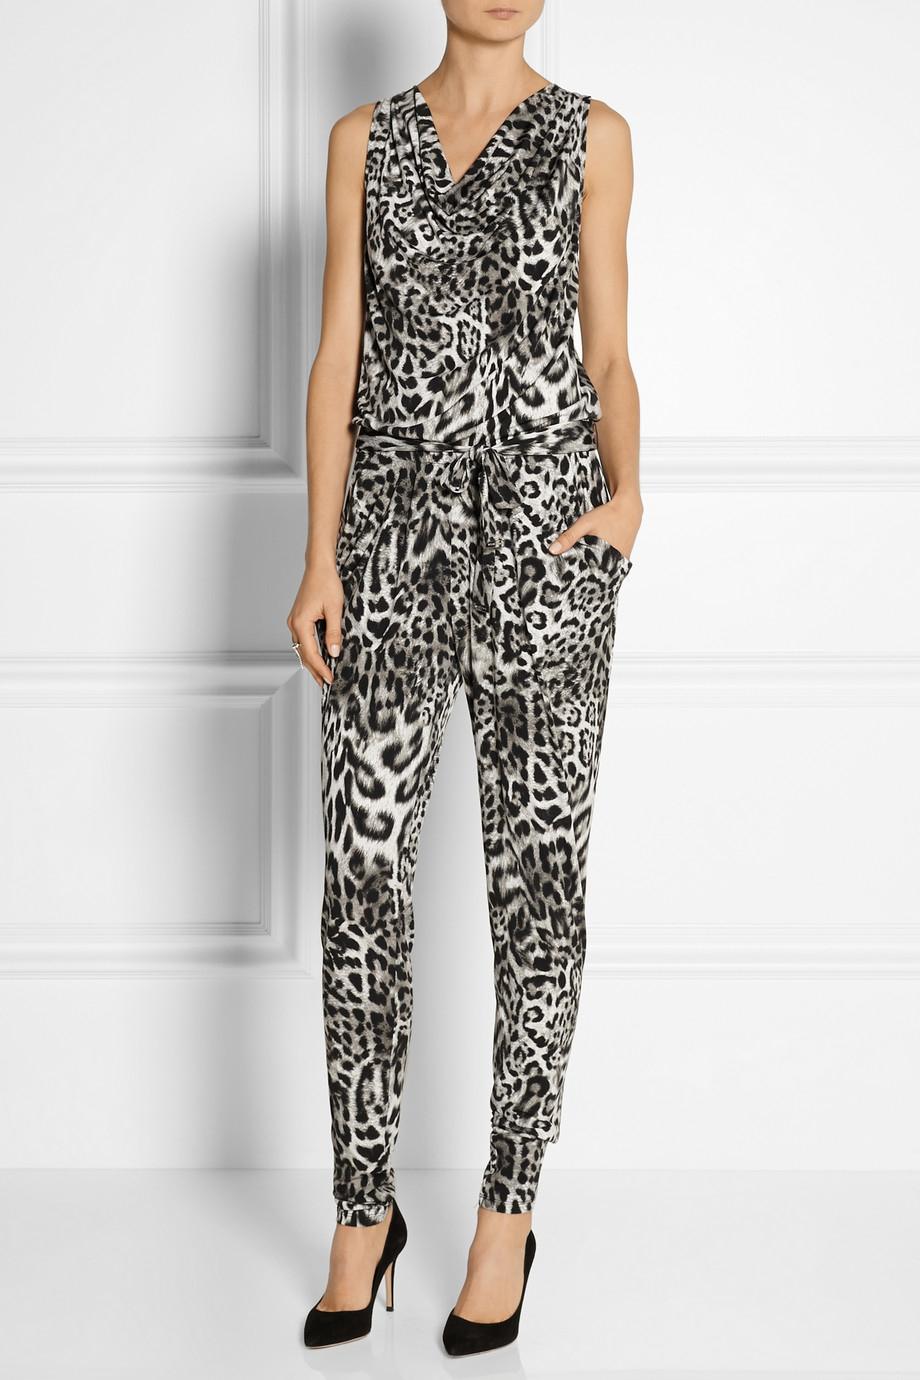 877486fc2c4 MICHAEL Michael Kors Leopard-Print Stretch-Jersey Jumpsuit in Gray ...